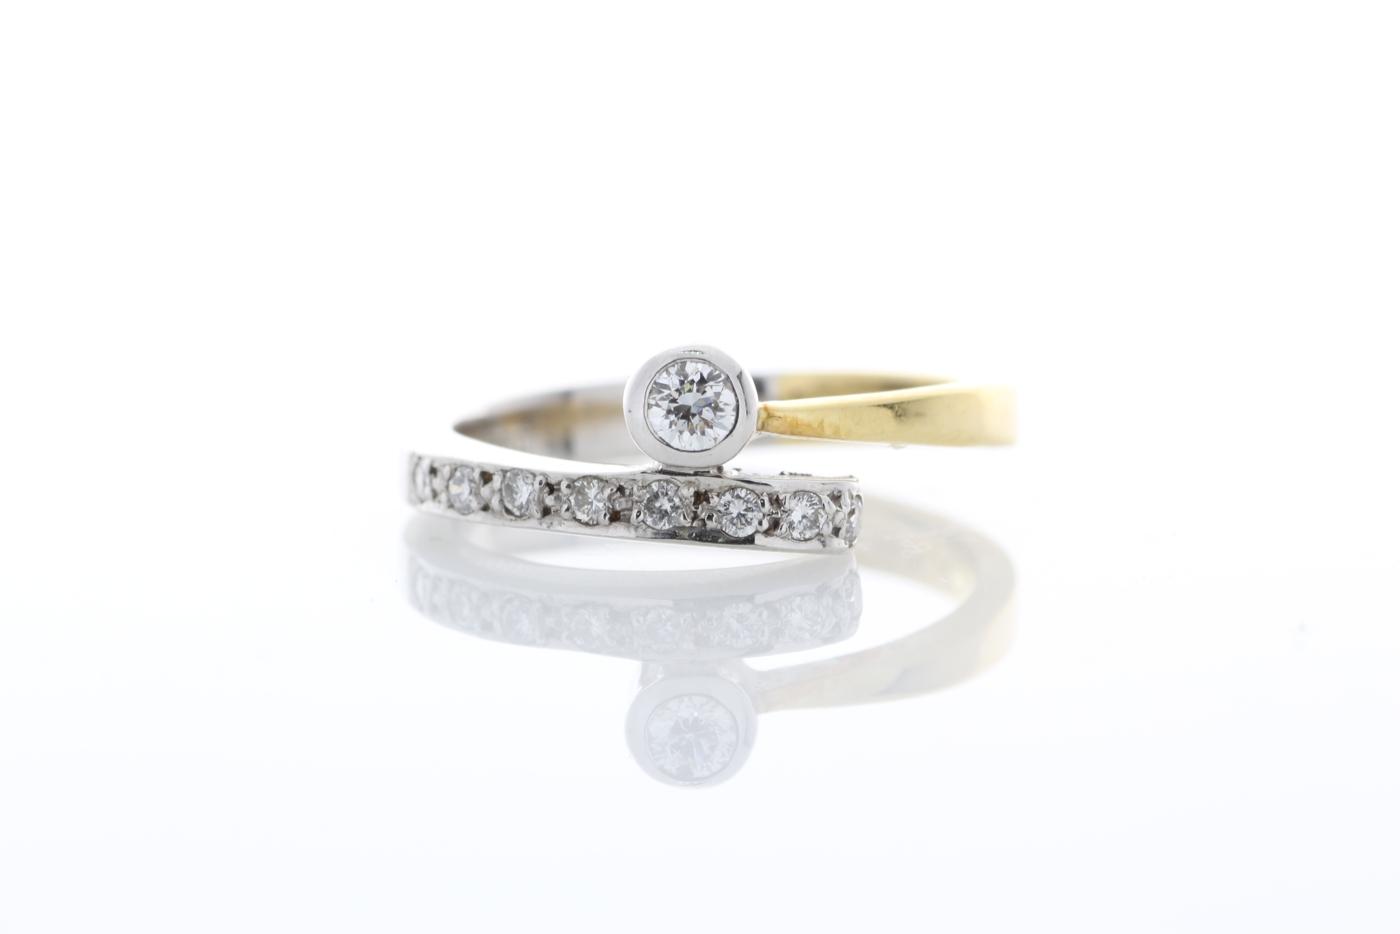 18ct Stone Set Shoulders Diamond Ring 0.11 Carats - Image 5 of 5